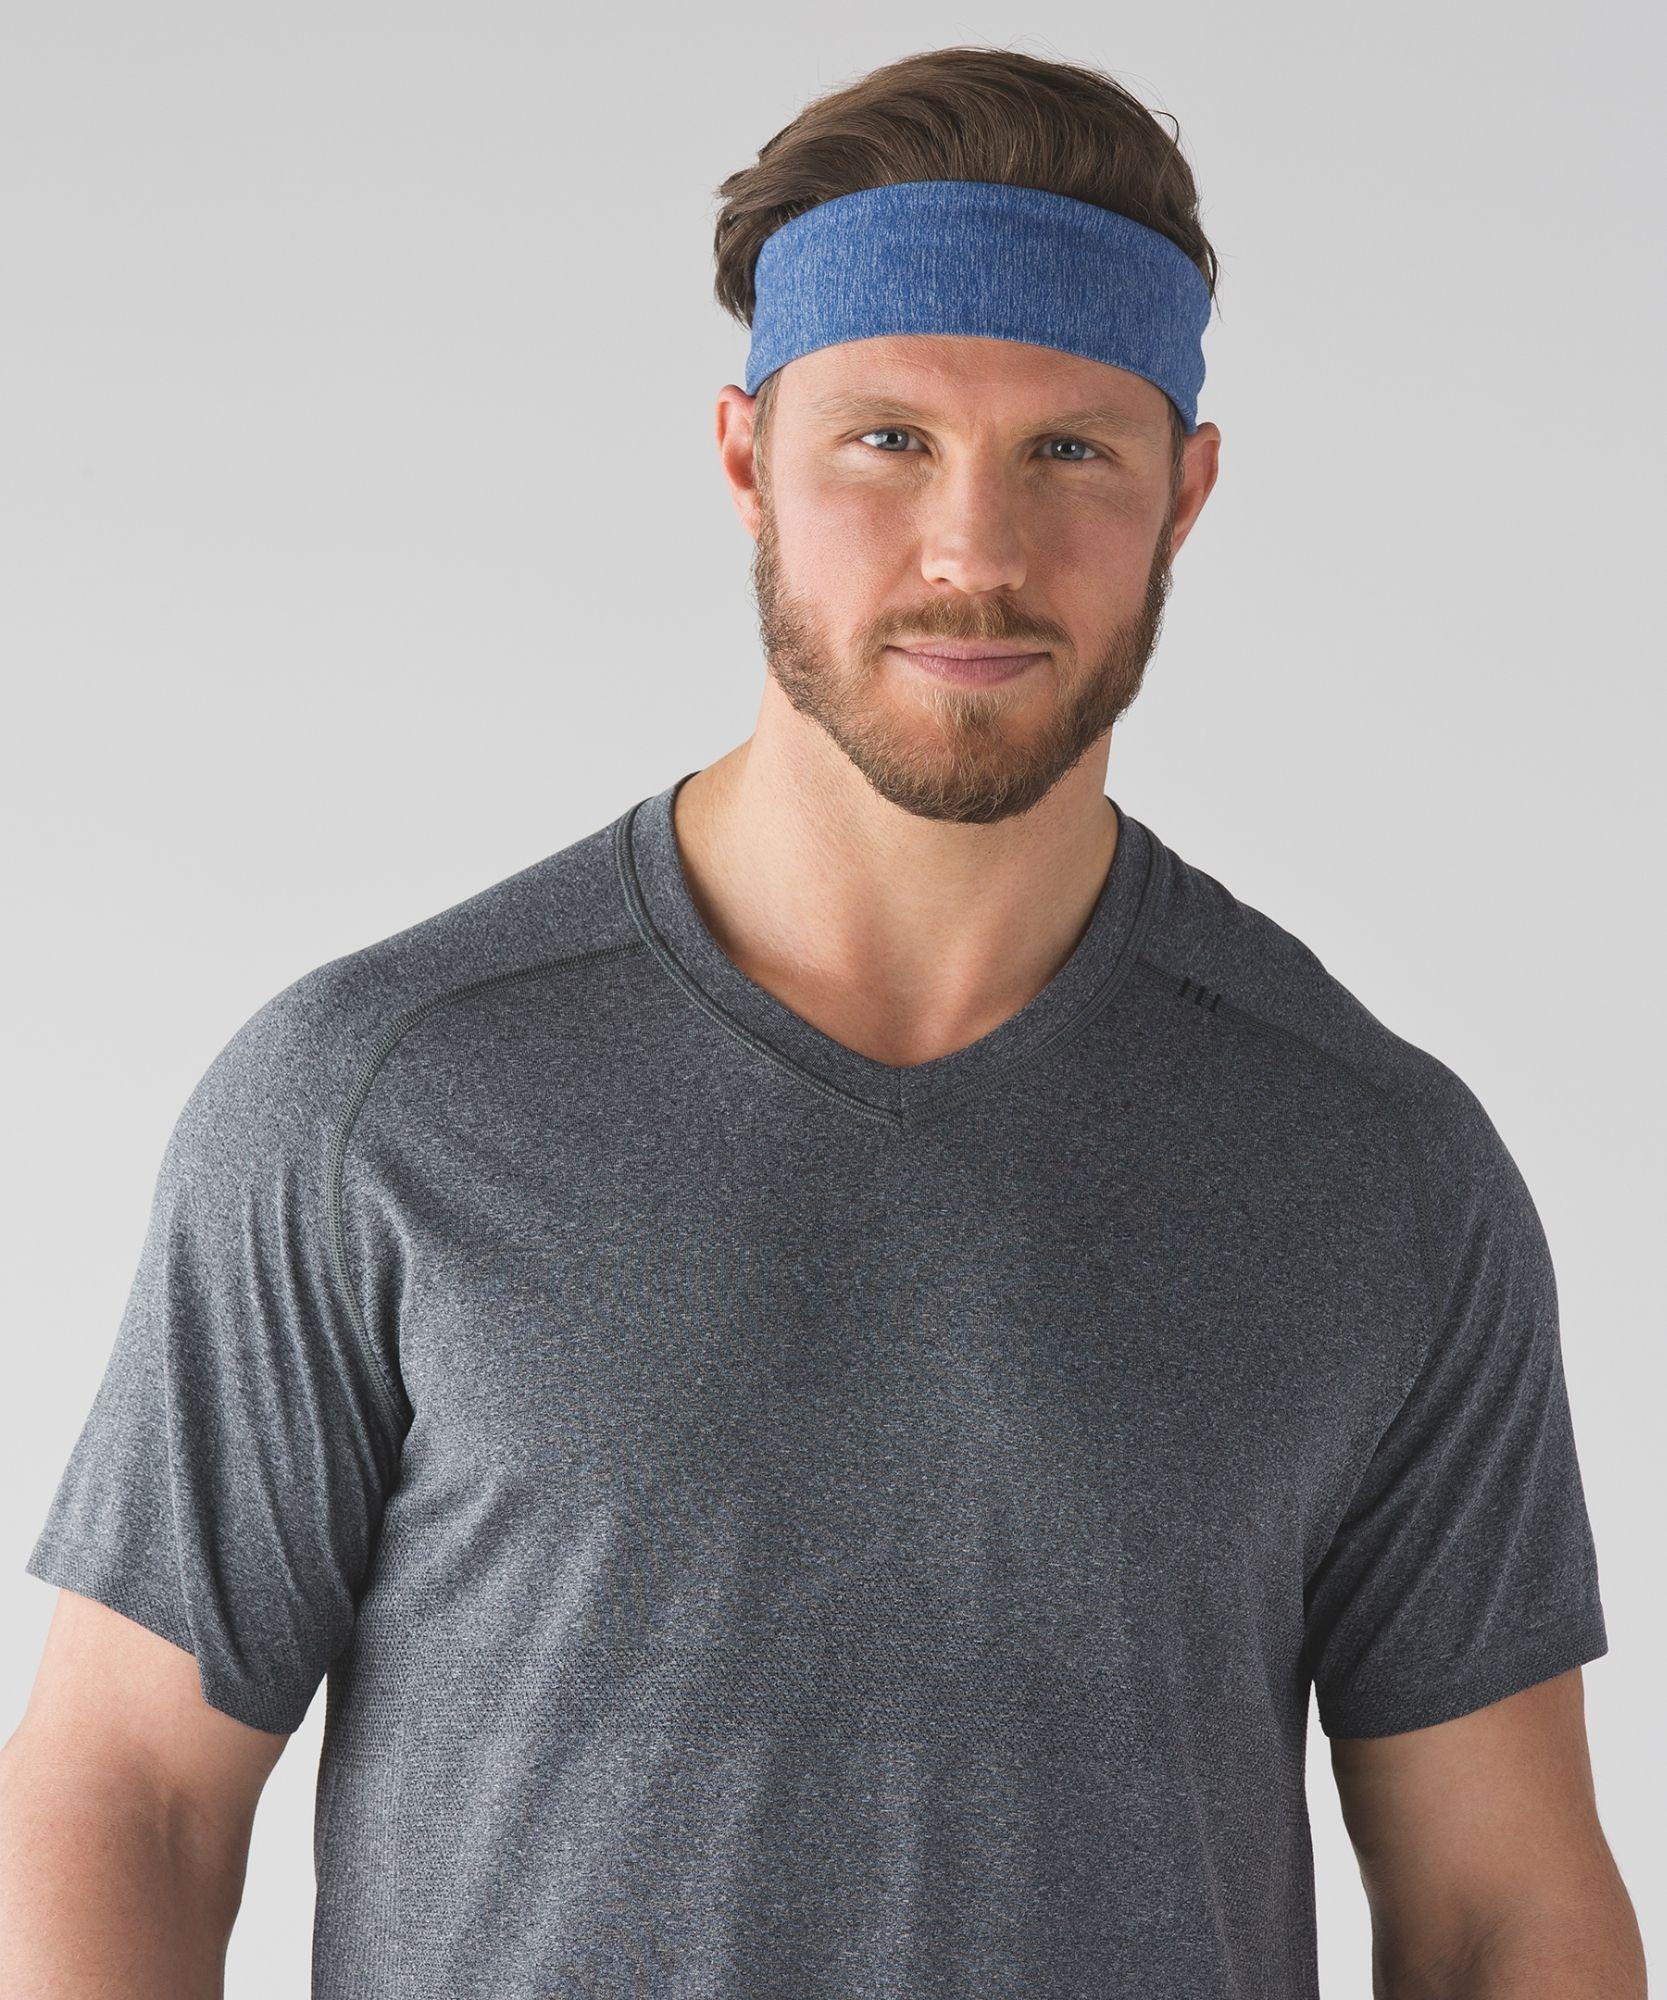 Men s Headband - T.H.E. Headband - lululemon  5624503432e5